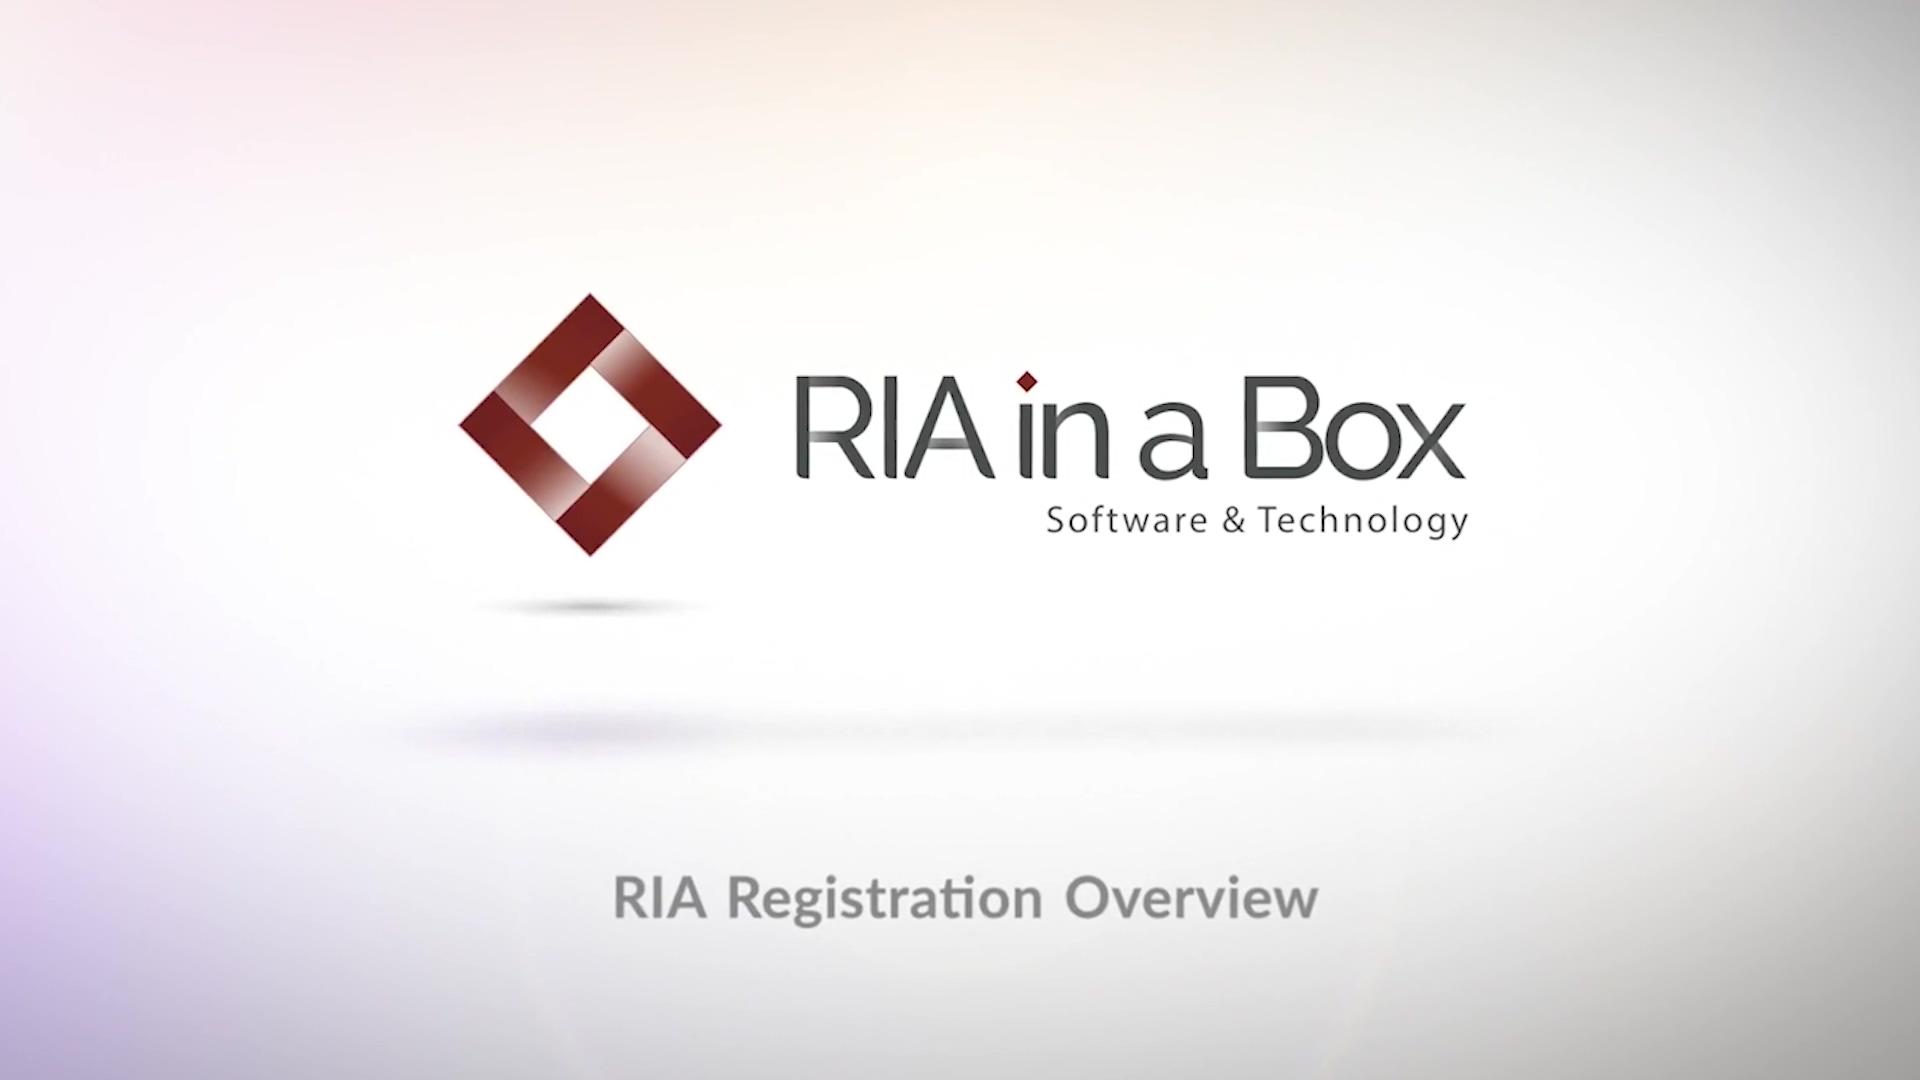 RIA Registration Overview